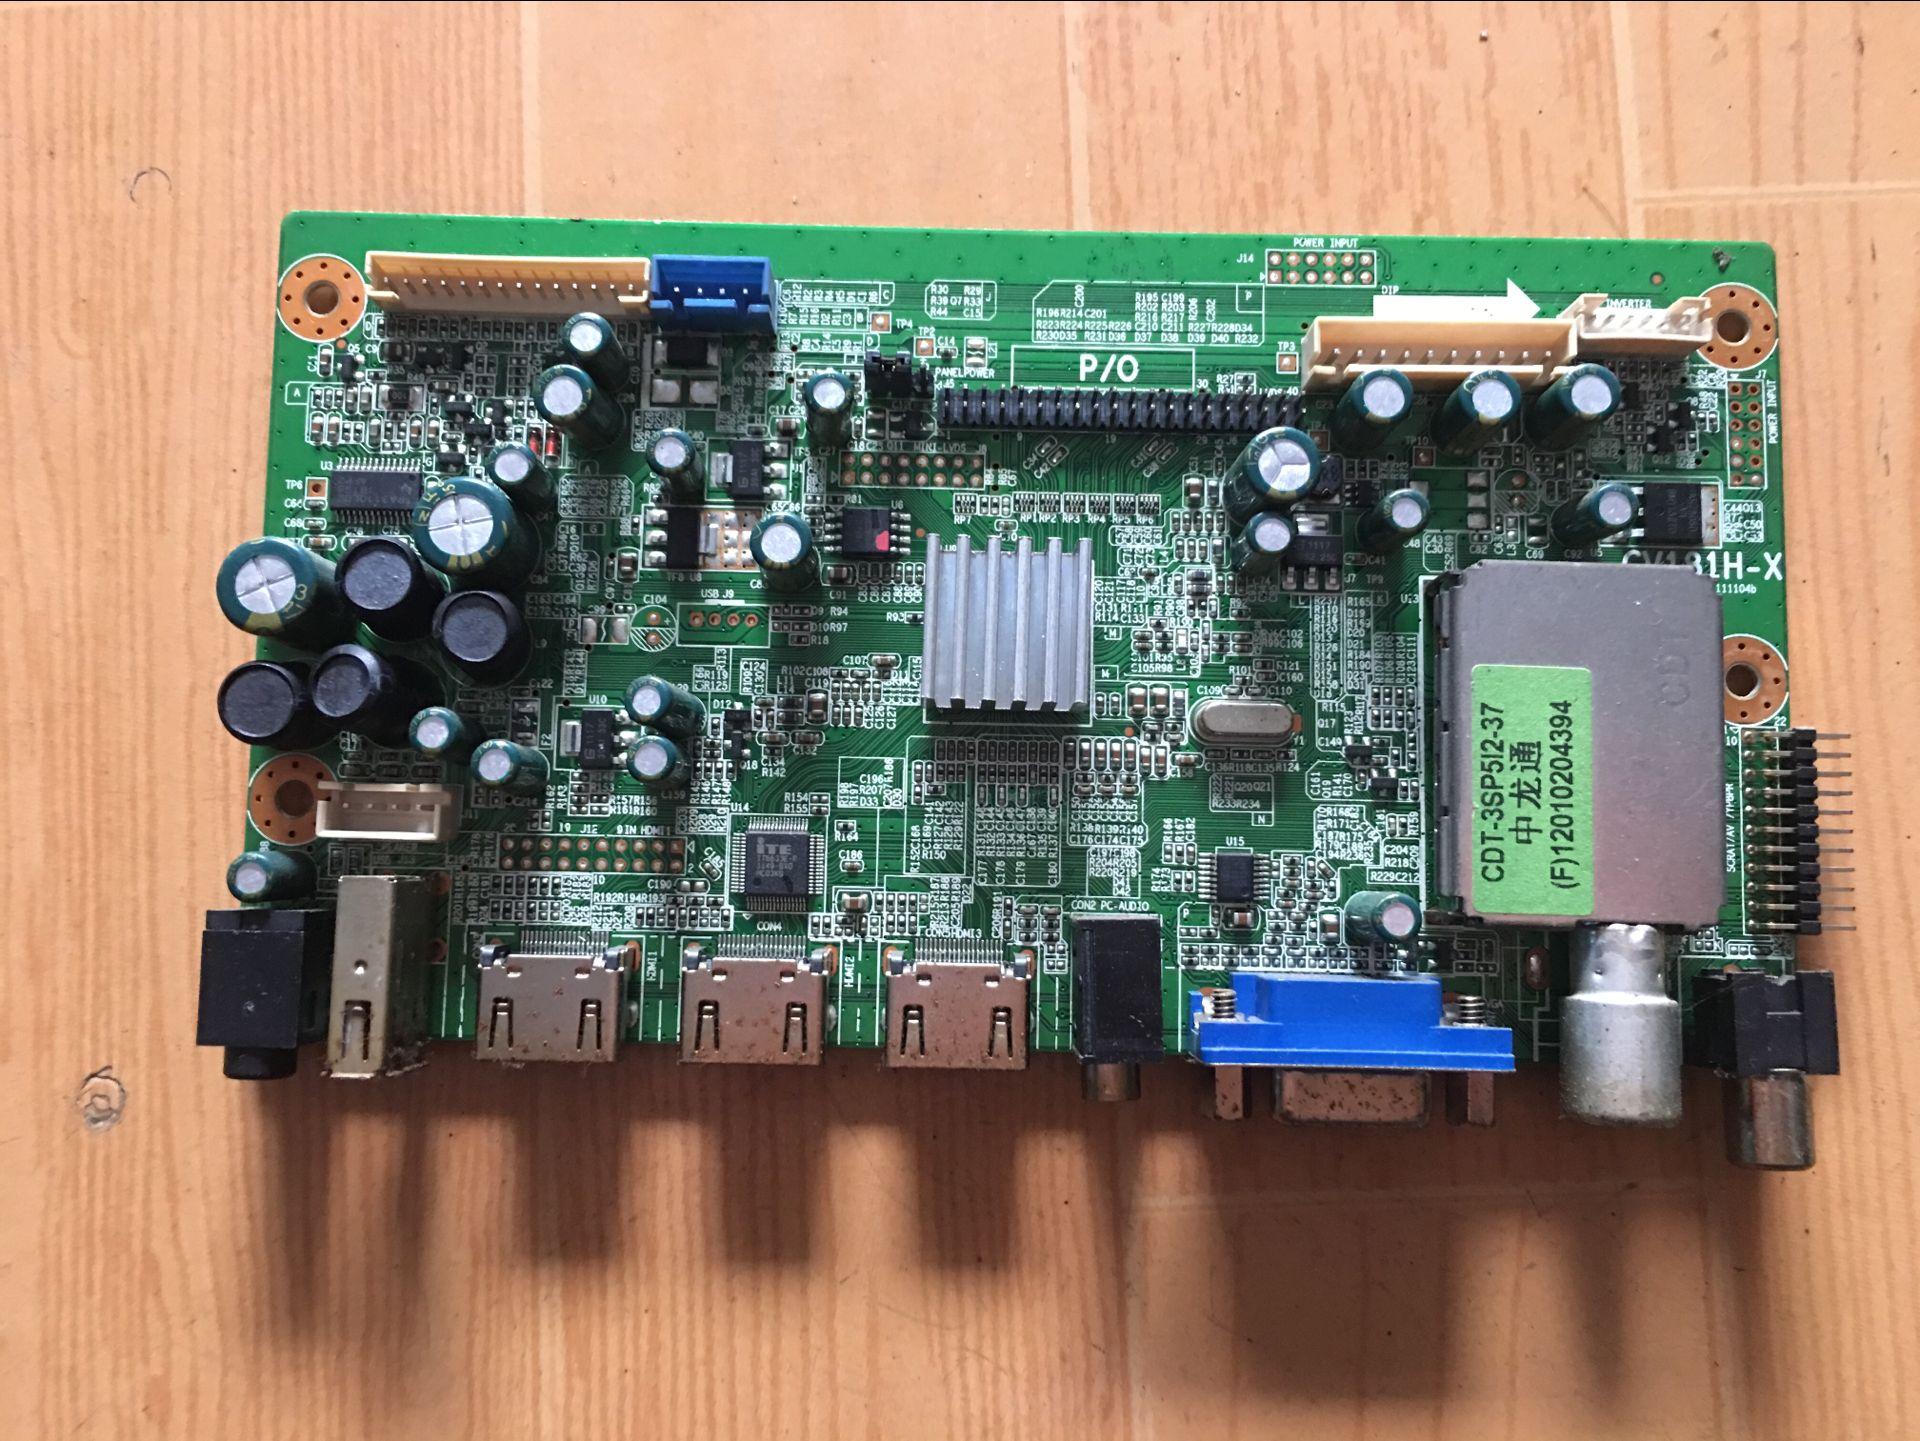 Original Bo Yige LTV3261 Motherboard CV181H-X Screen LTA320AP29